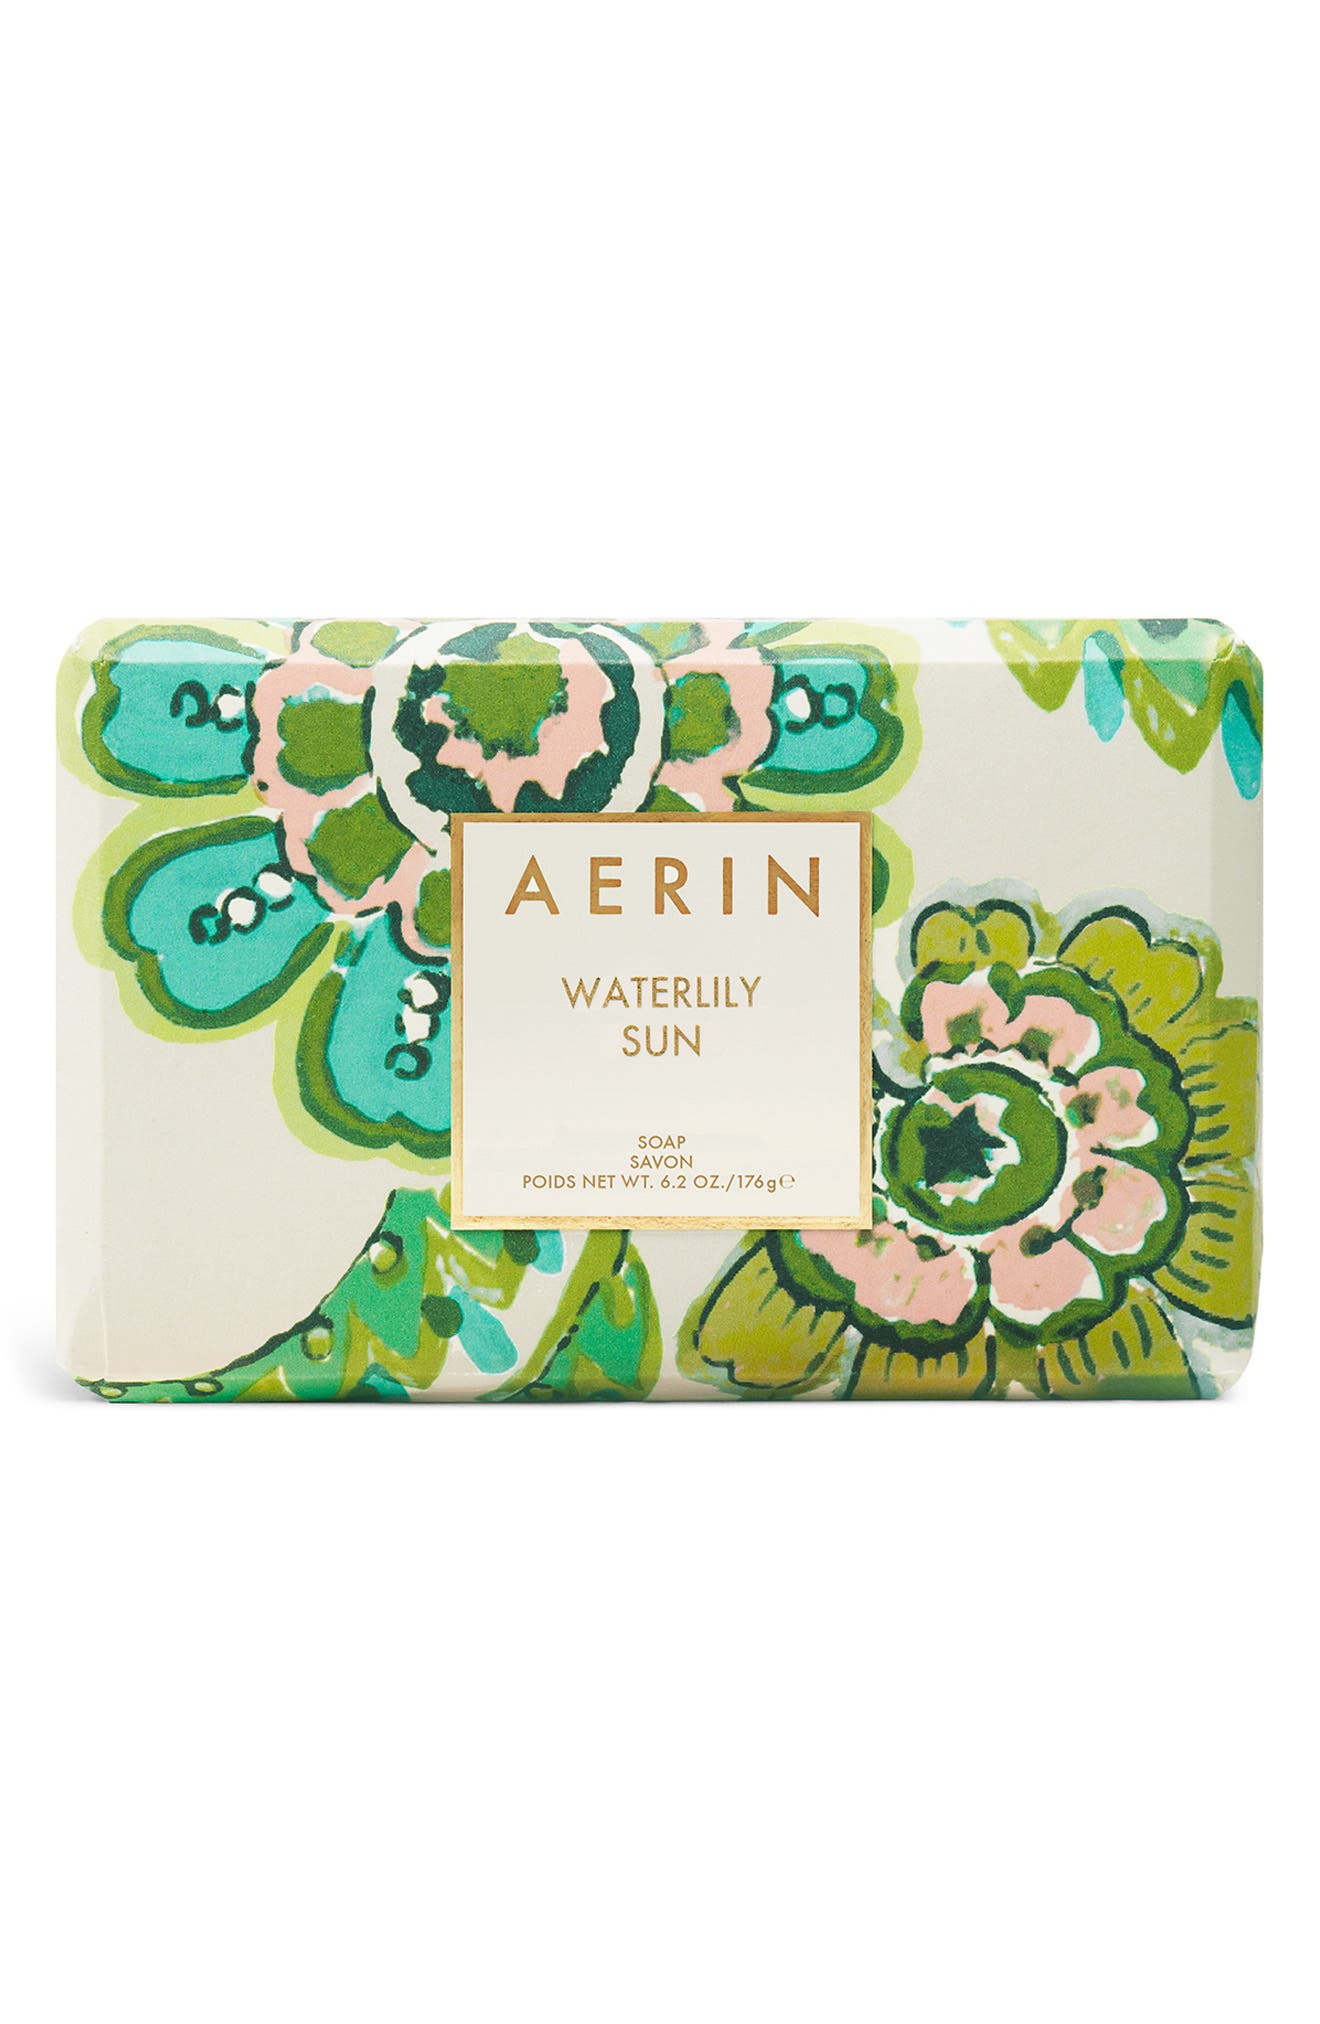 ESTÉE LAUDER AERIN Beauty Waterlily Sun Soap